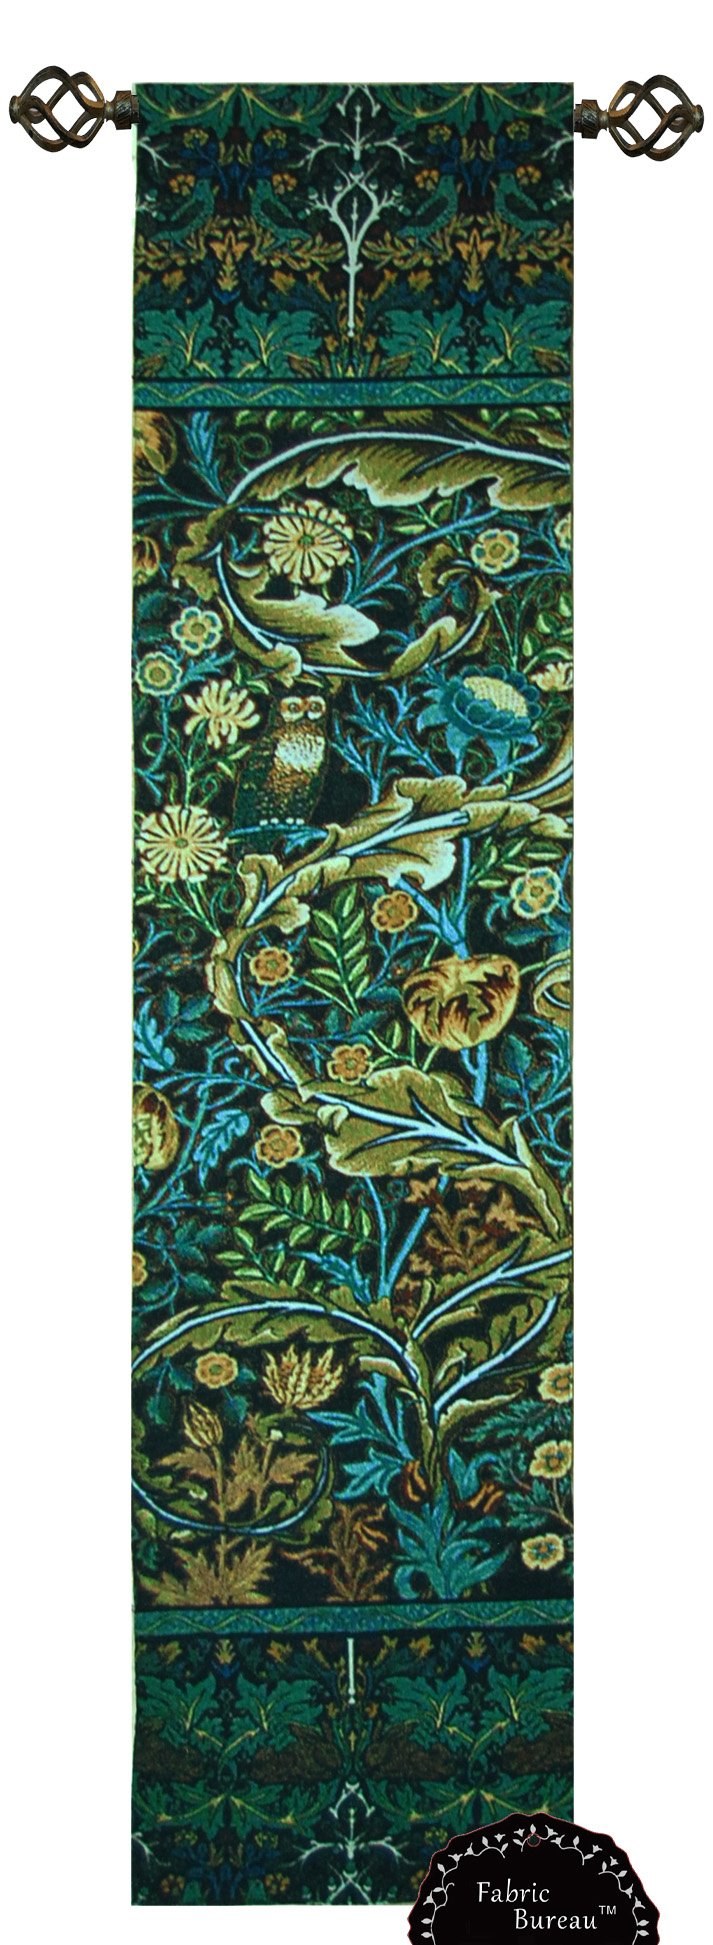 Decor Plus Beautiful William Morris Tree of Life Blue Green Wood Panel Jacquard Tapestry Wall Hanging (Yw011) (11''X48''(Series I))